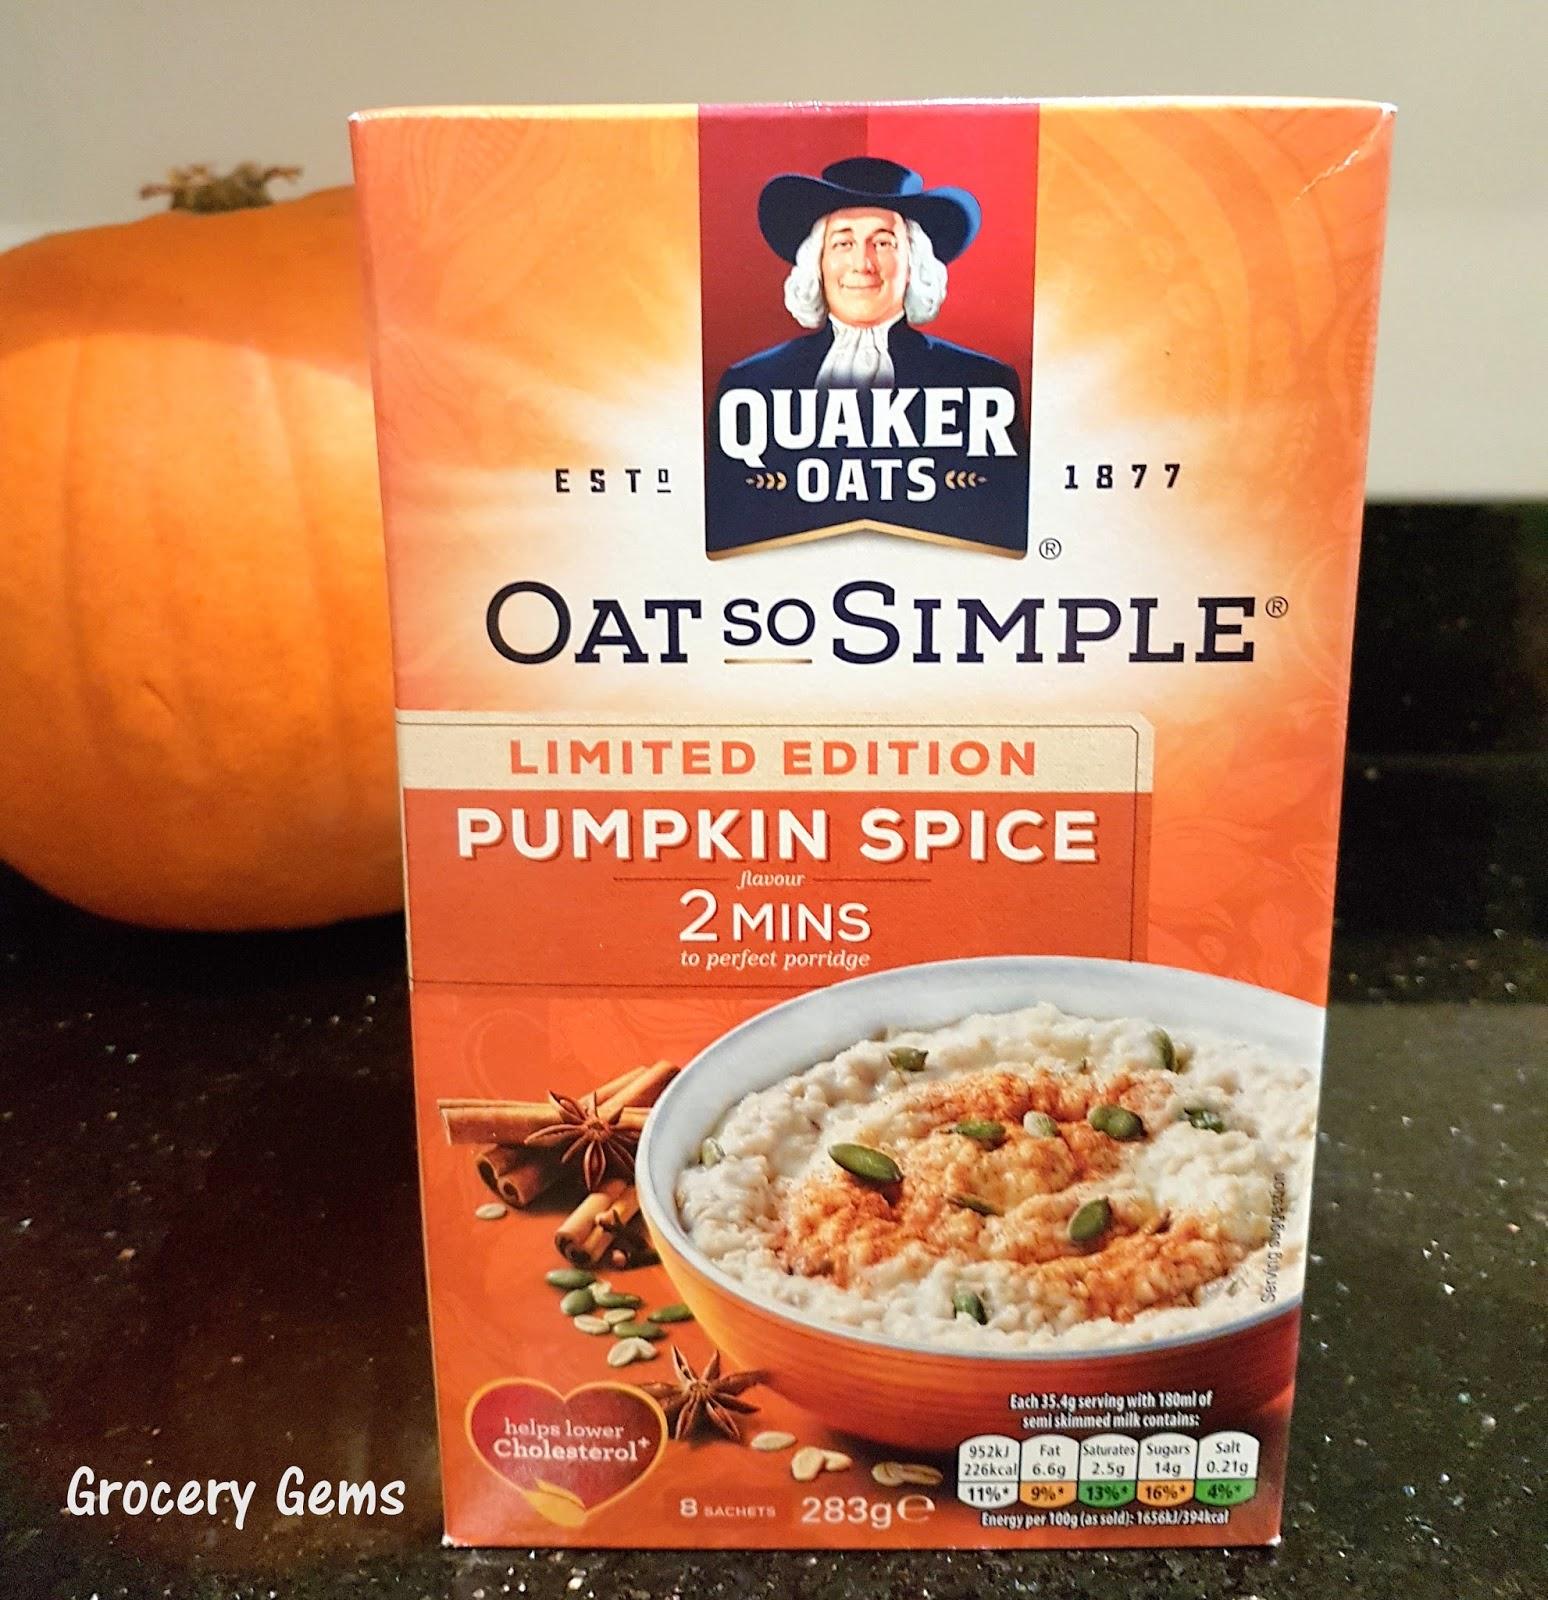 Pumpkin spice uk